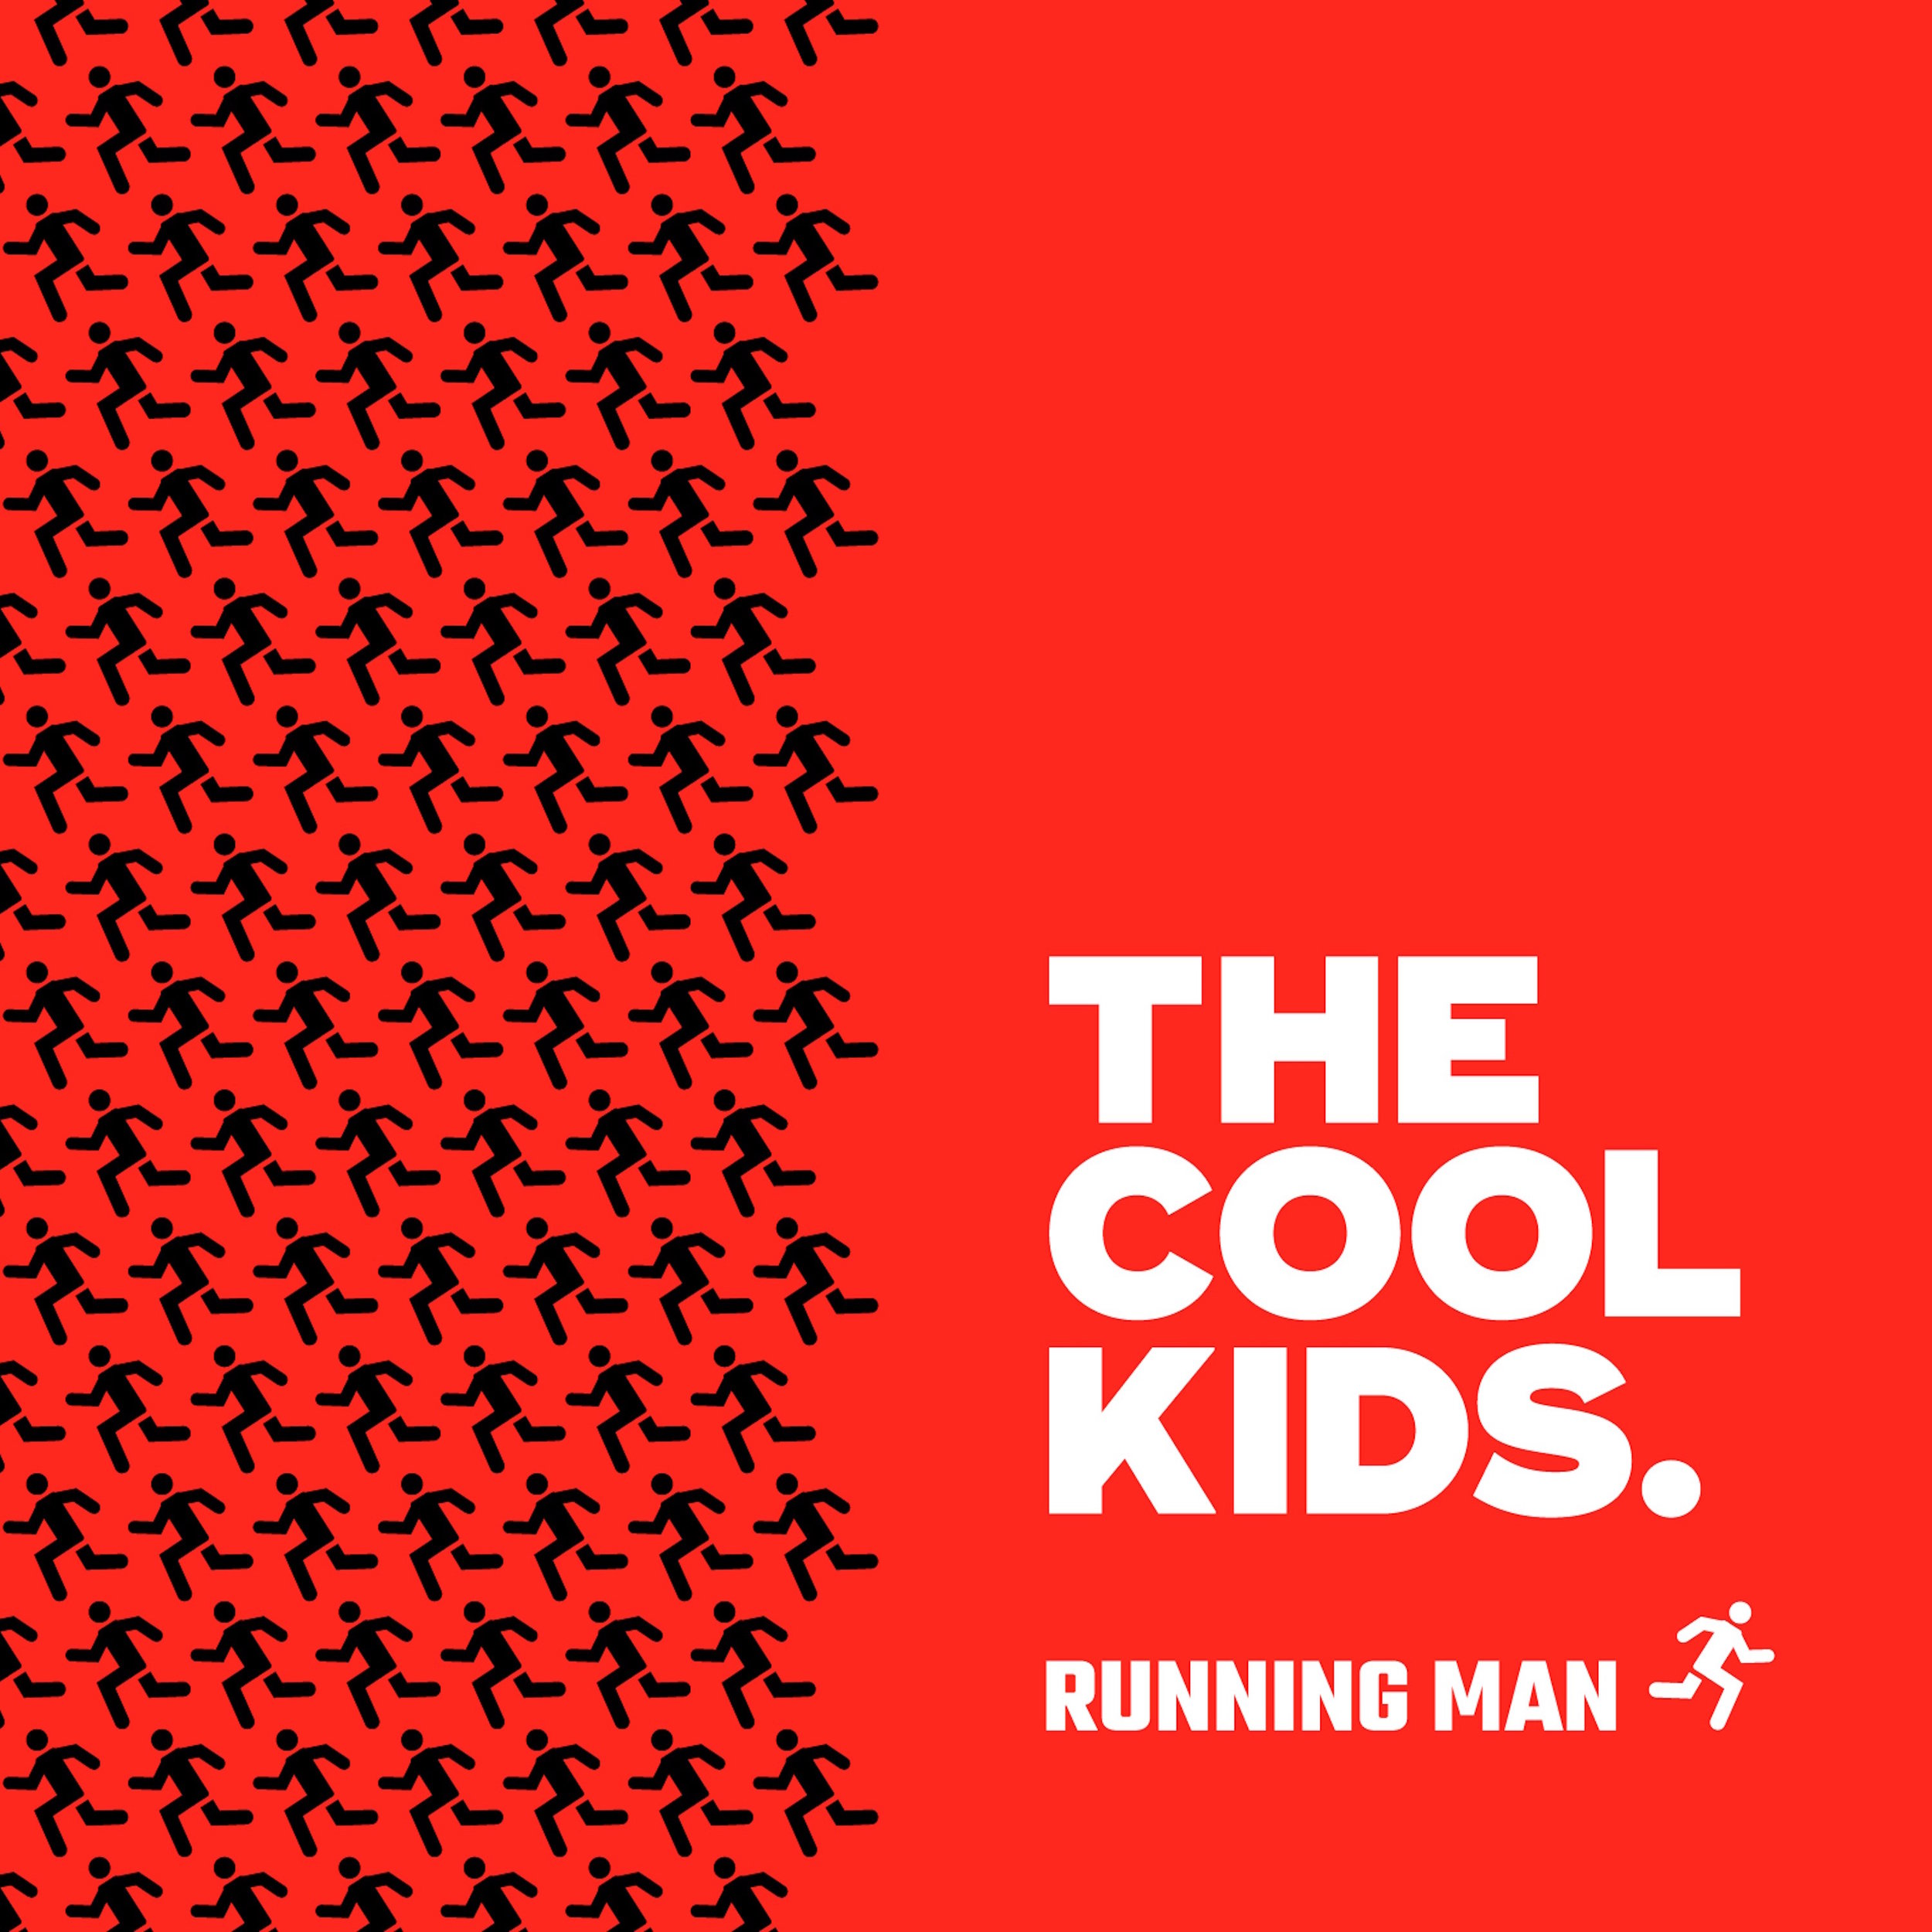 The Cool Kids   Running Man single